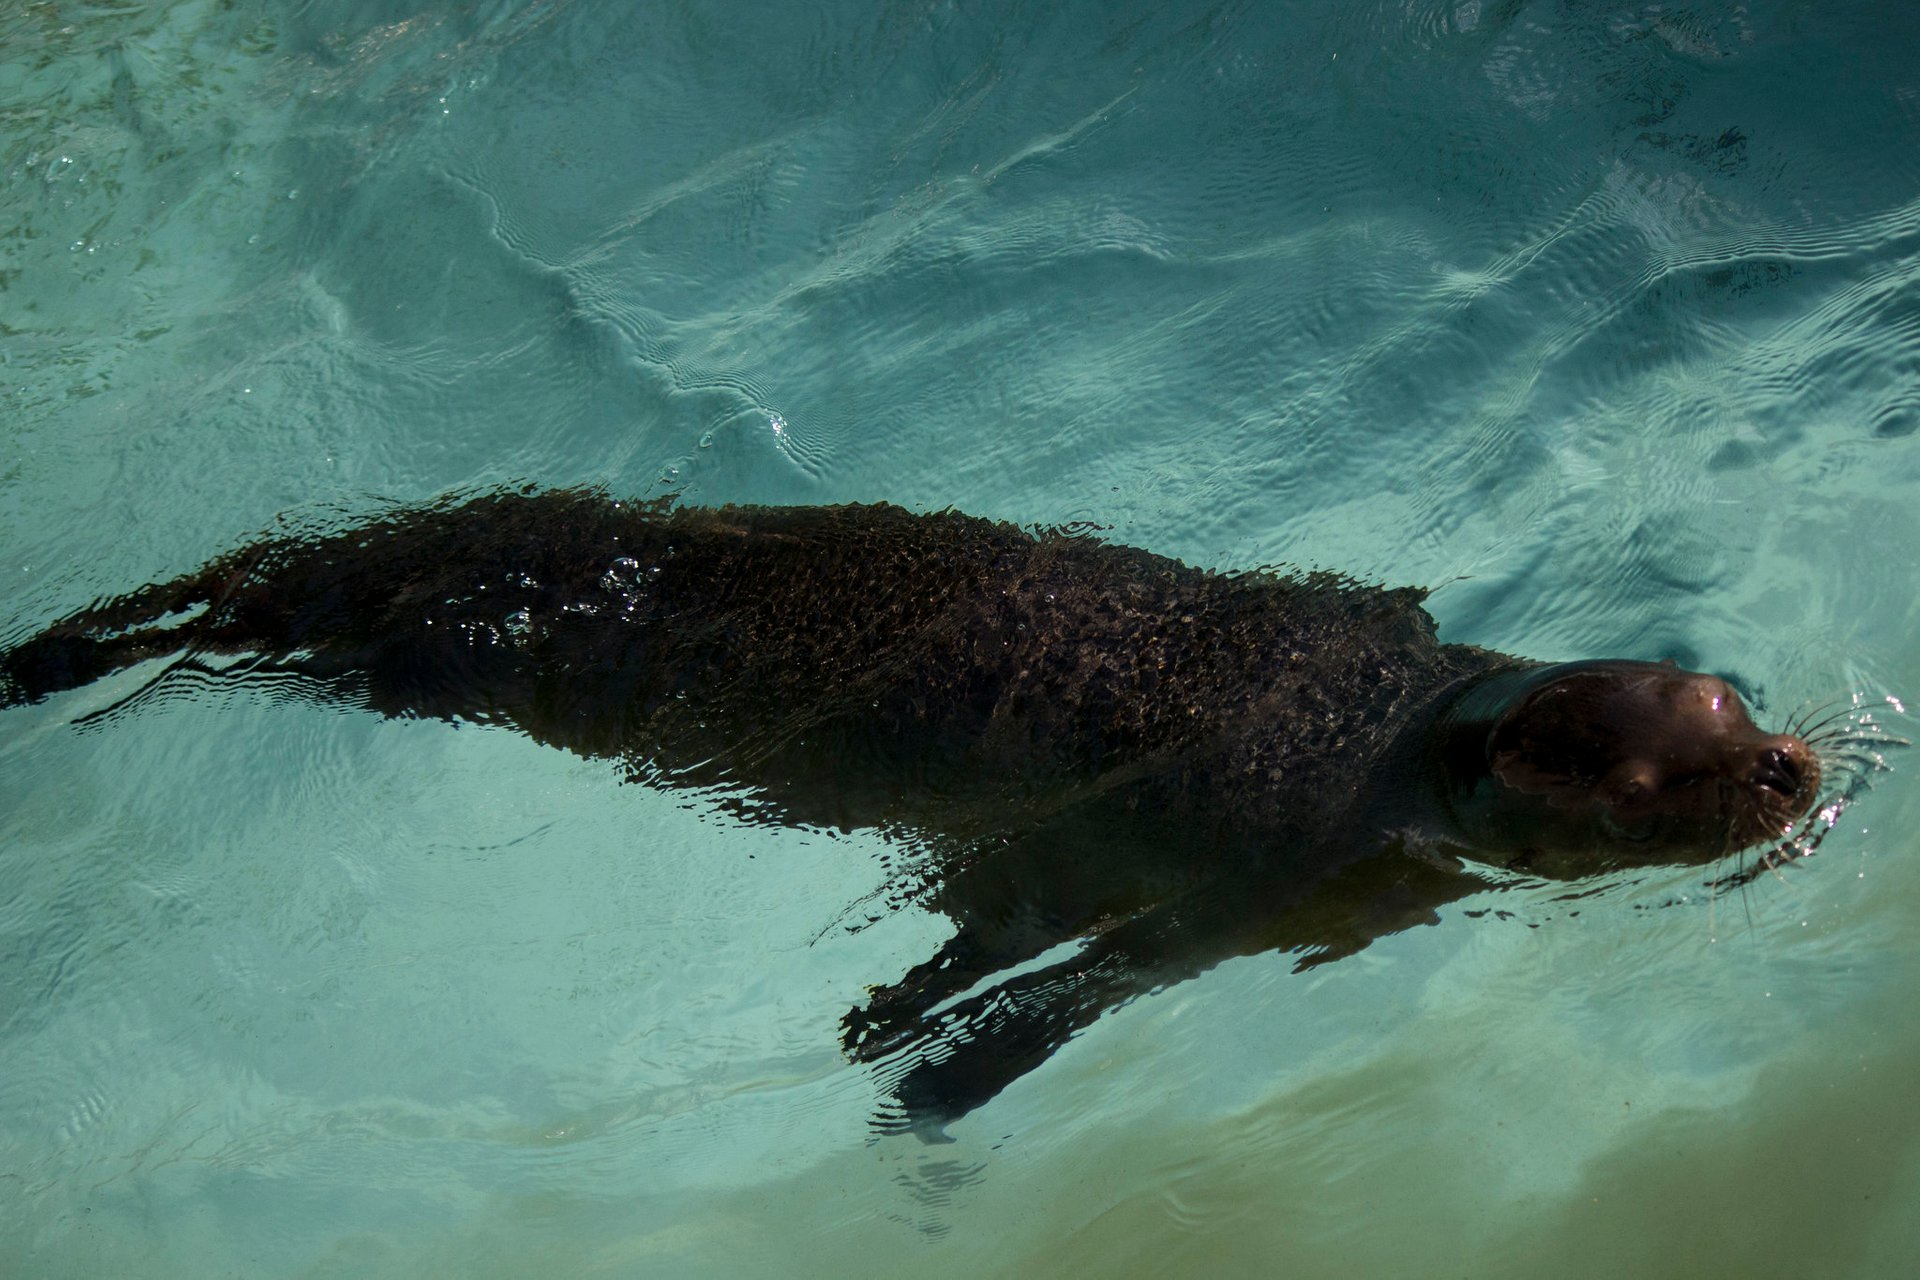 Seal at the Pittsburgh Zoo & PPG Aquarium 2020